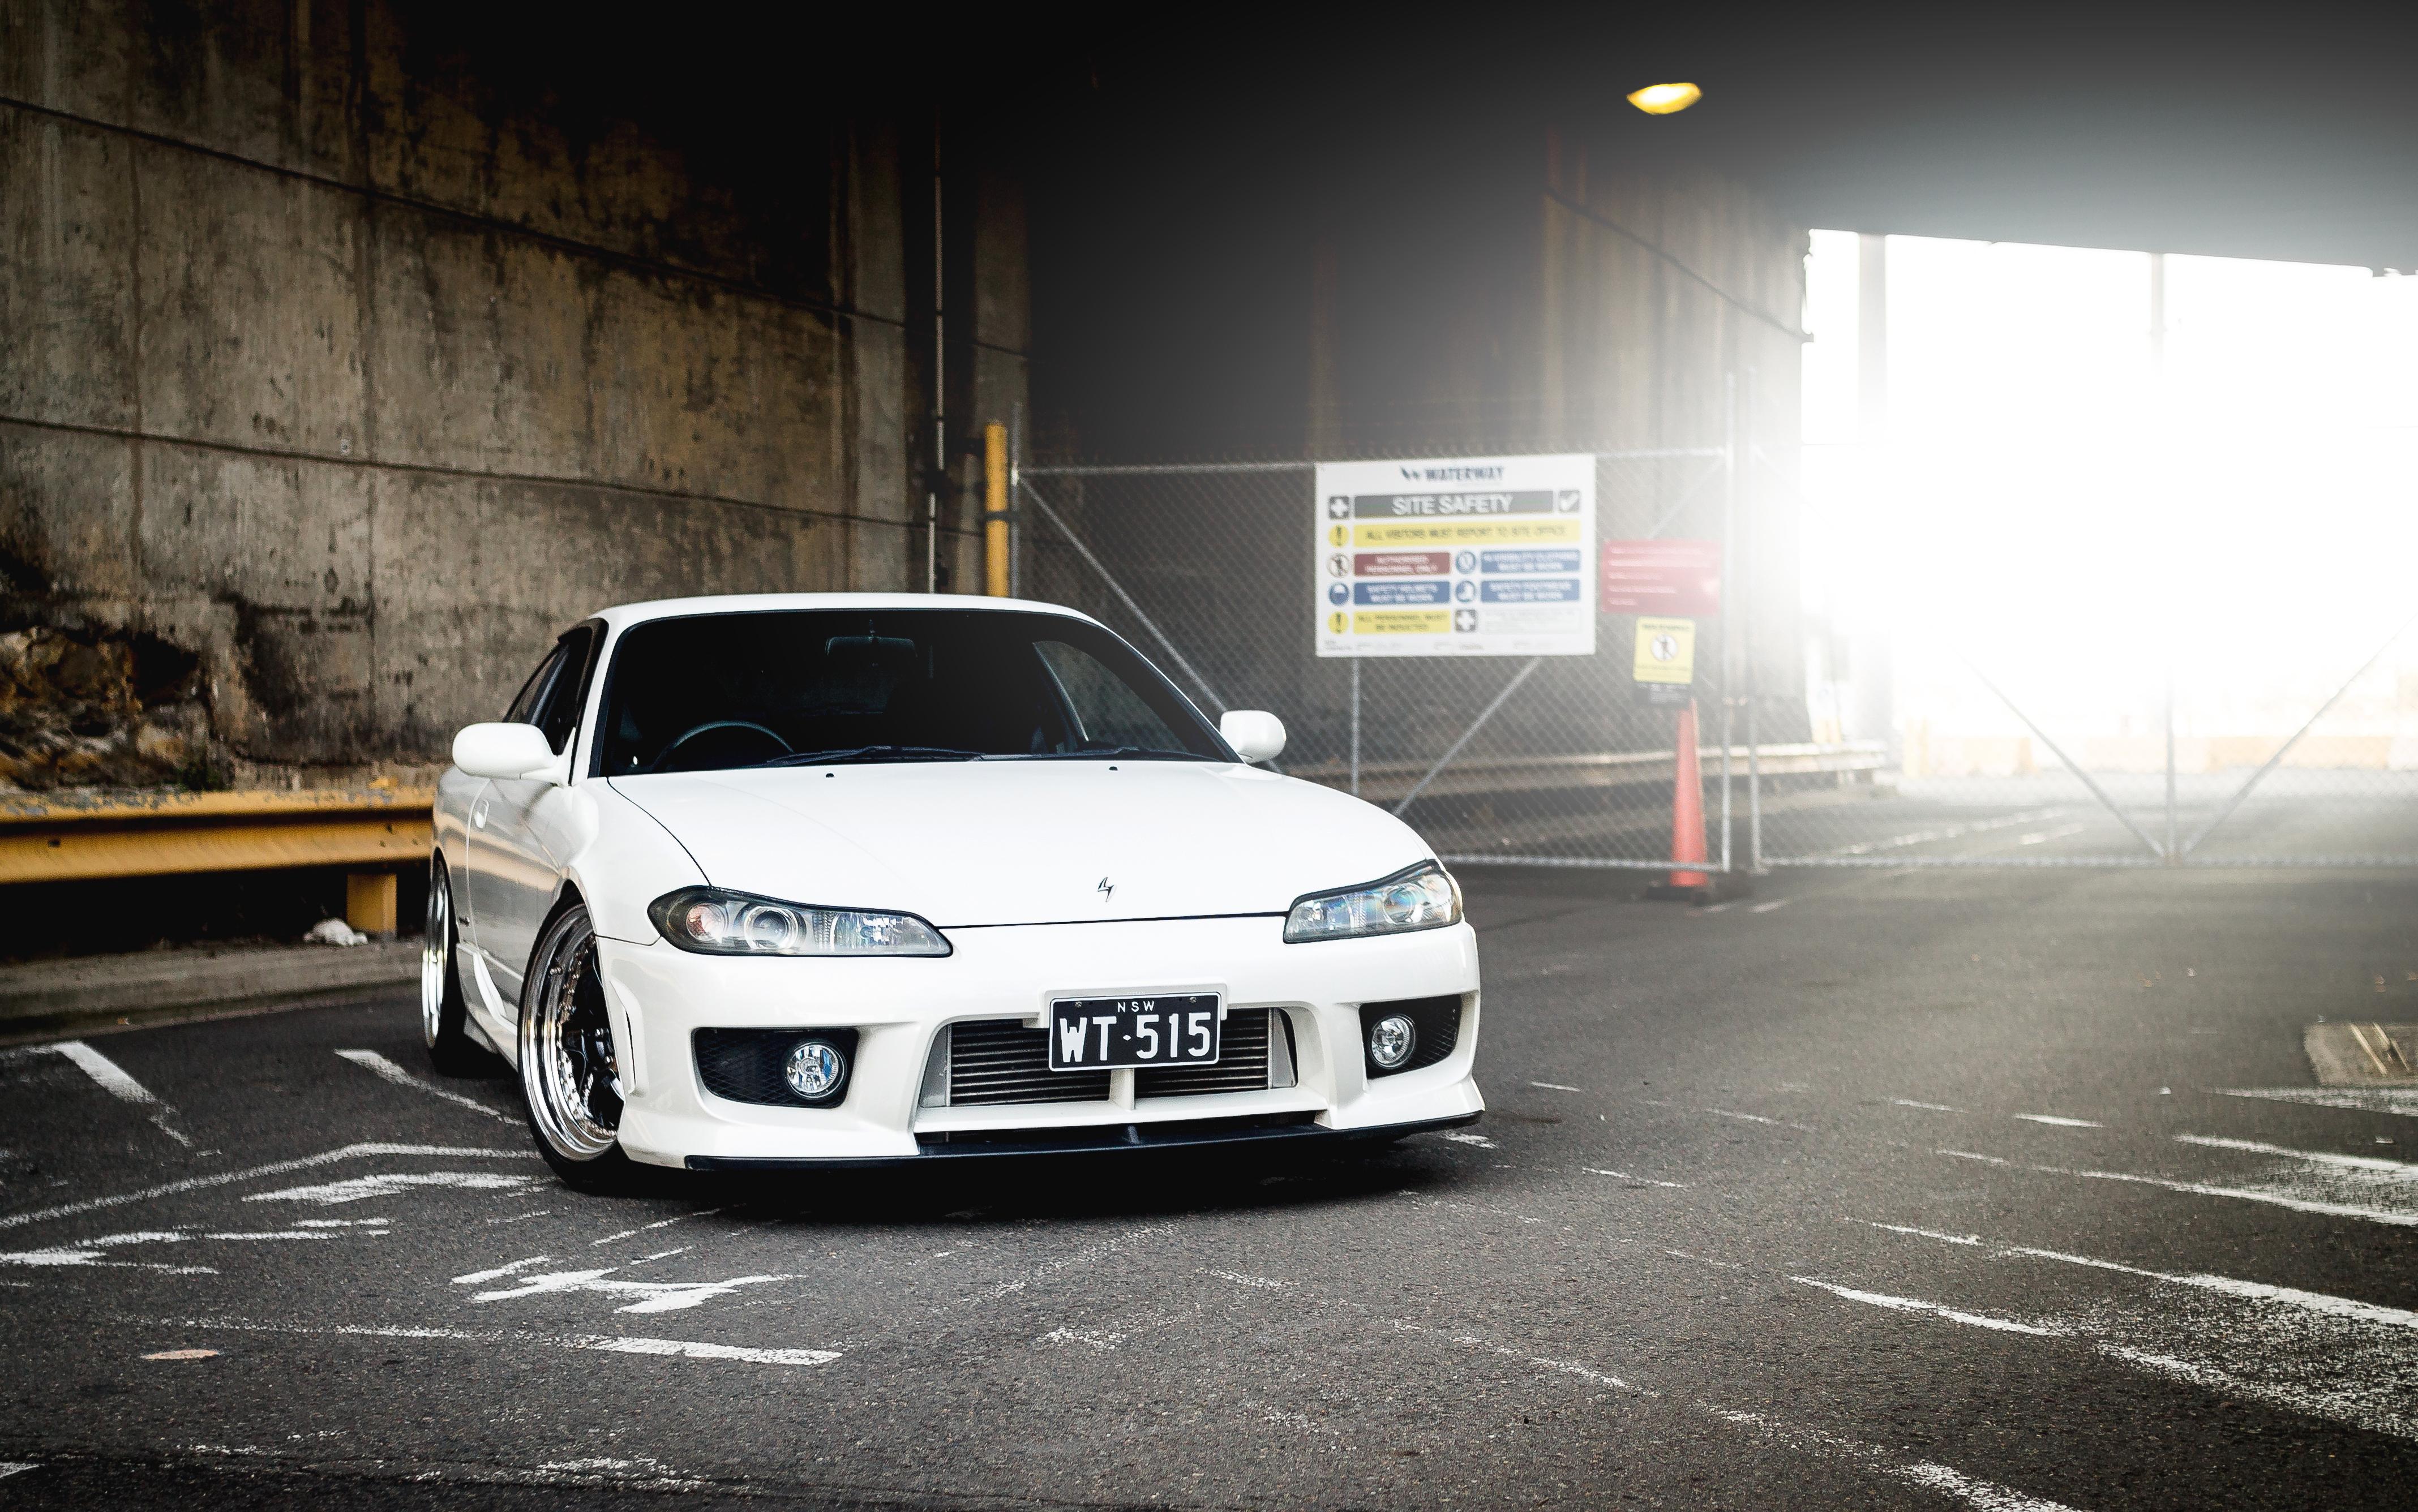 Nissan Silvia S15 4k Ultra Fondo De Pantalla Hd Fondo De